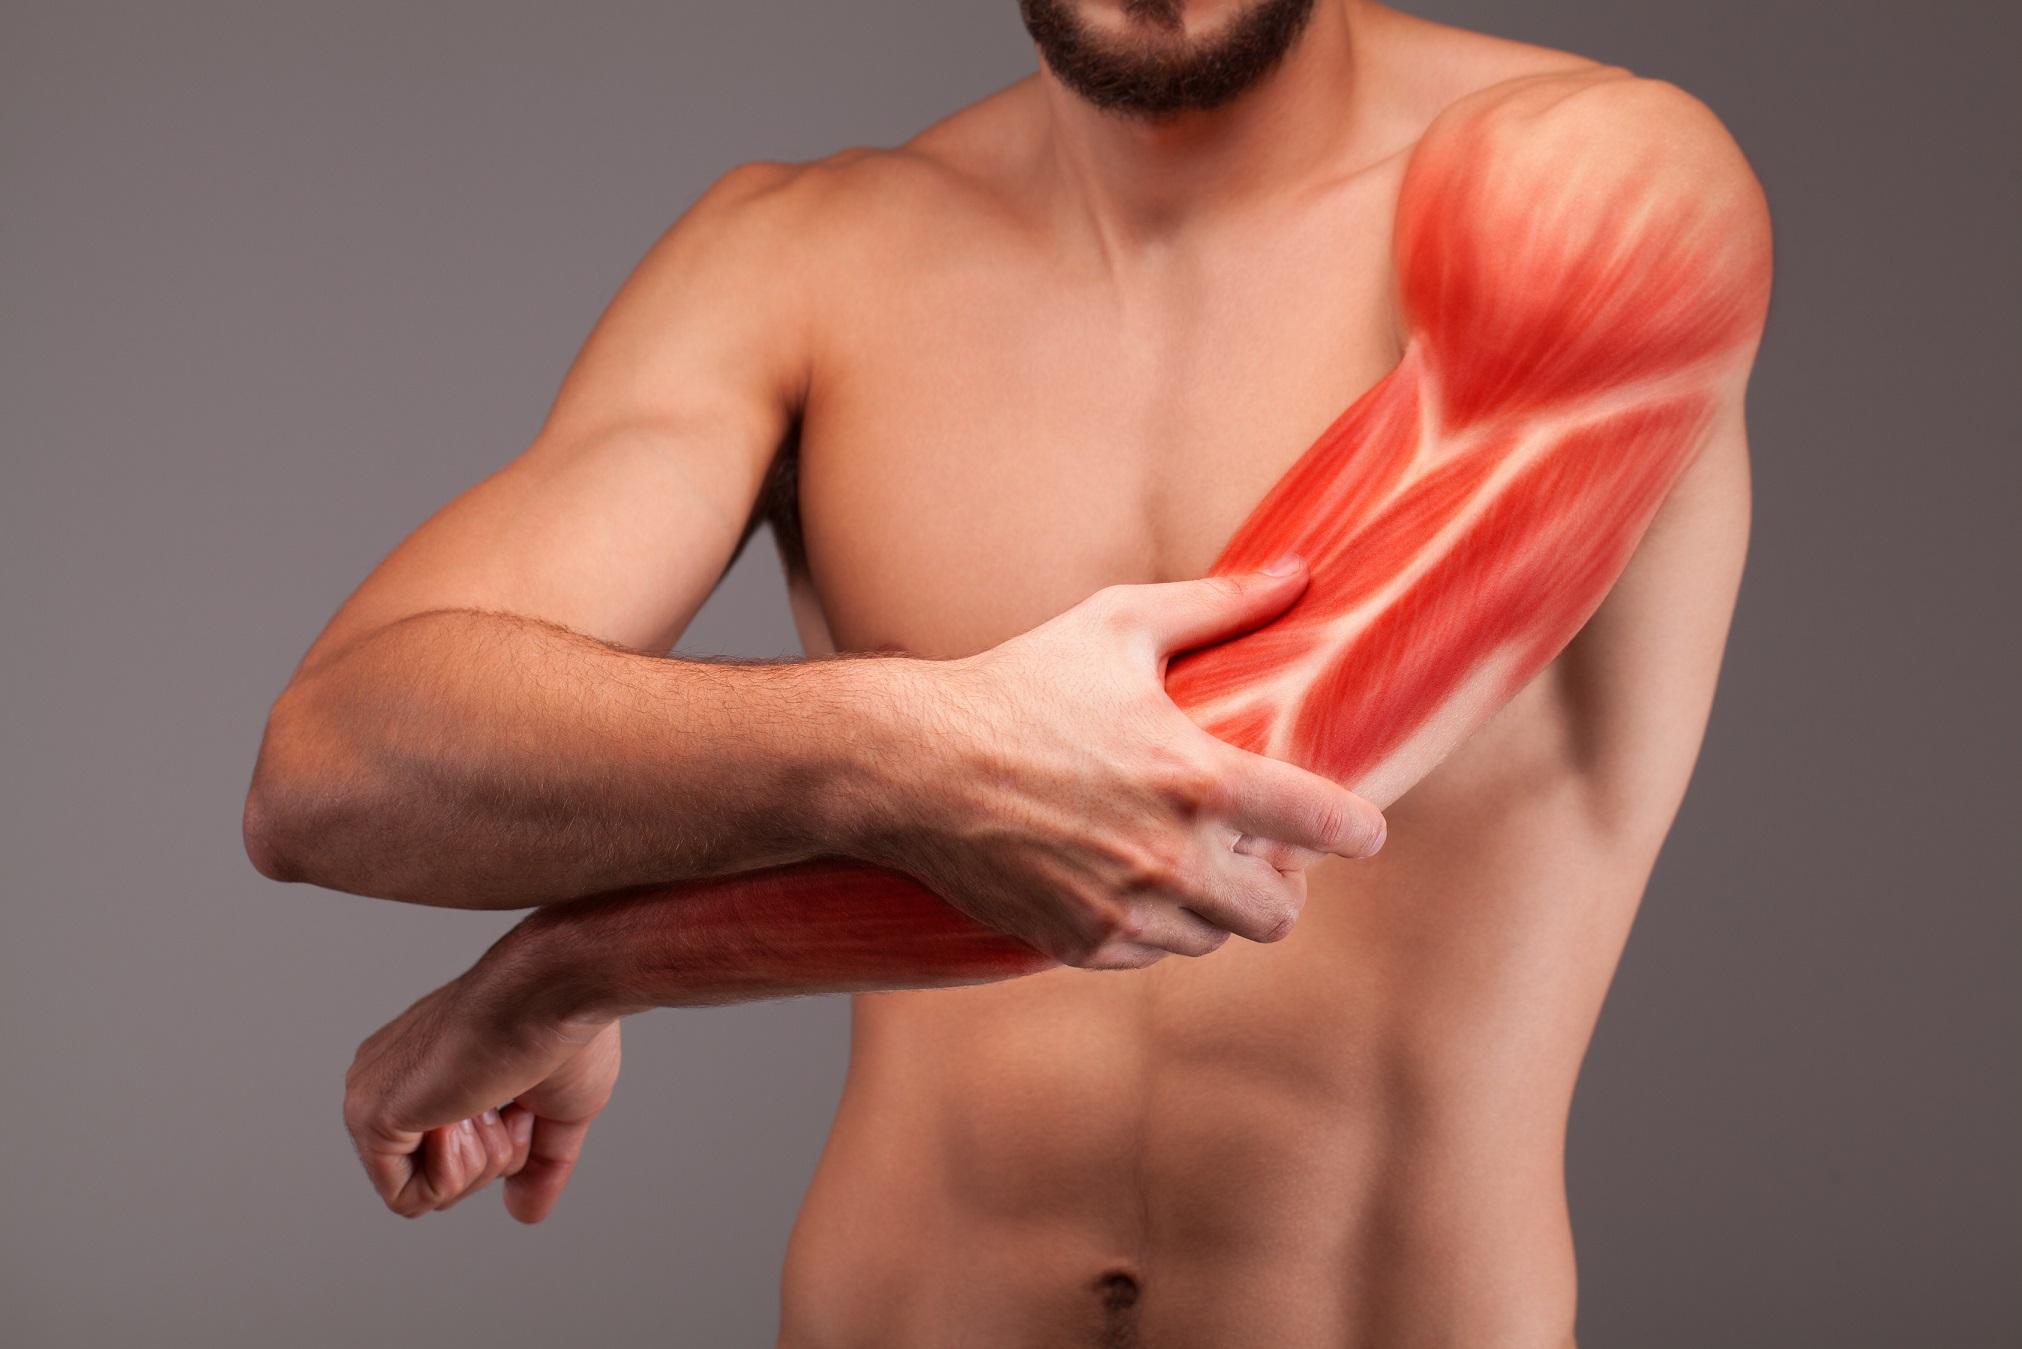 ziehende schmerzen im linken arm